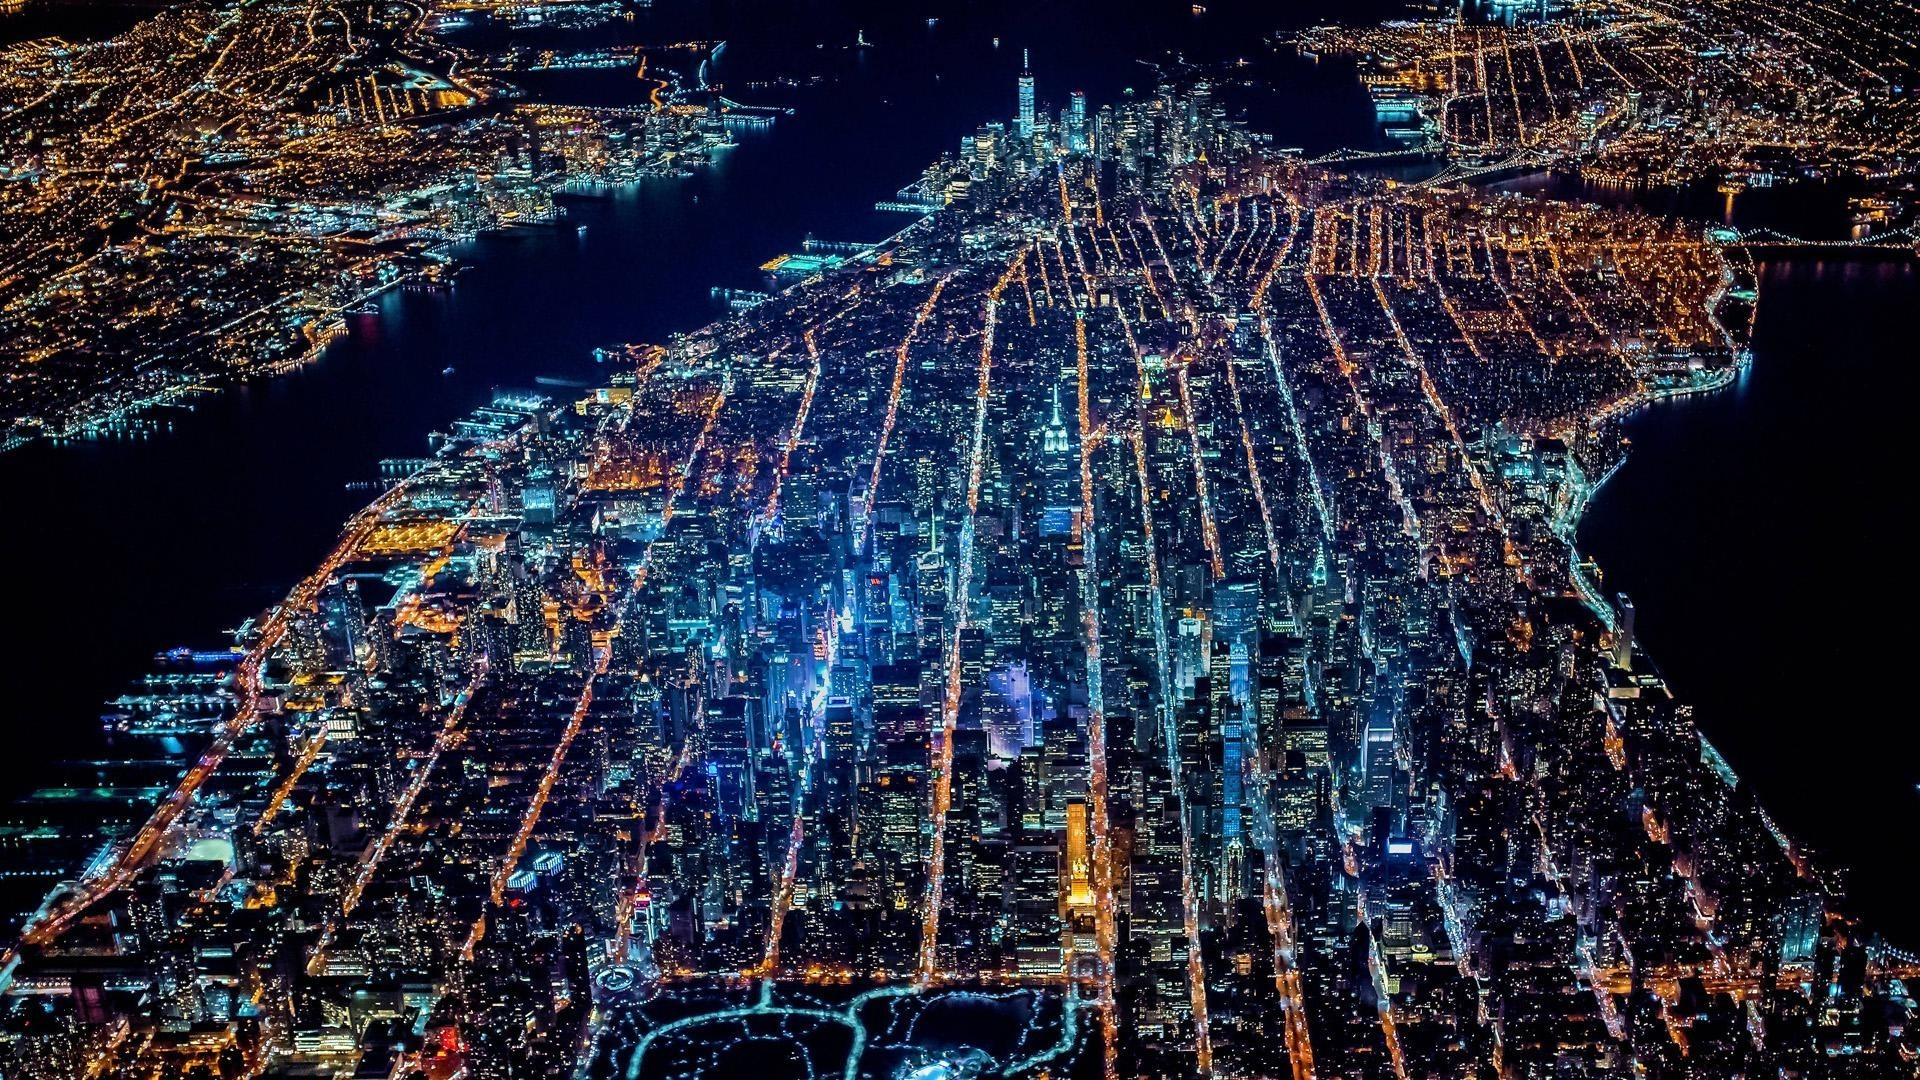 Veneno Hd Wallpaper Street Wallpaper Hd Night City 66 Images